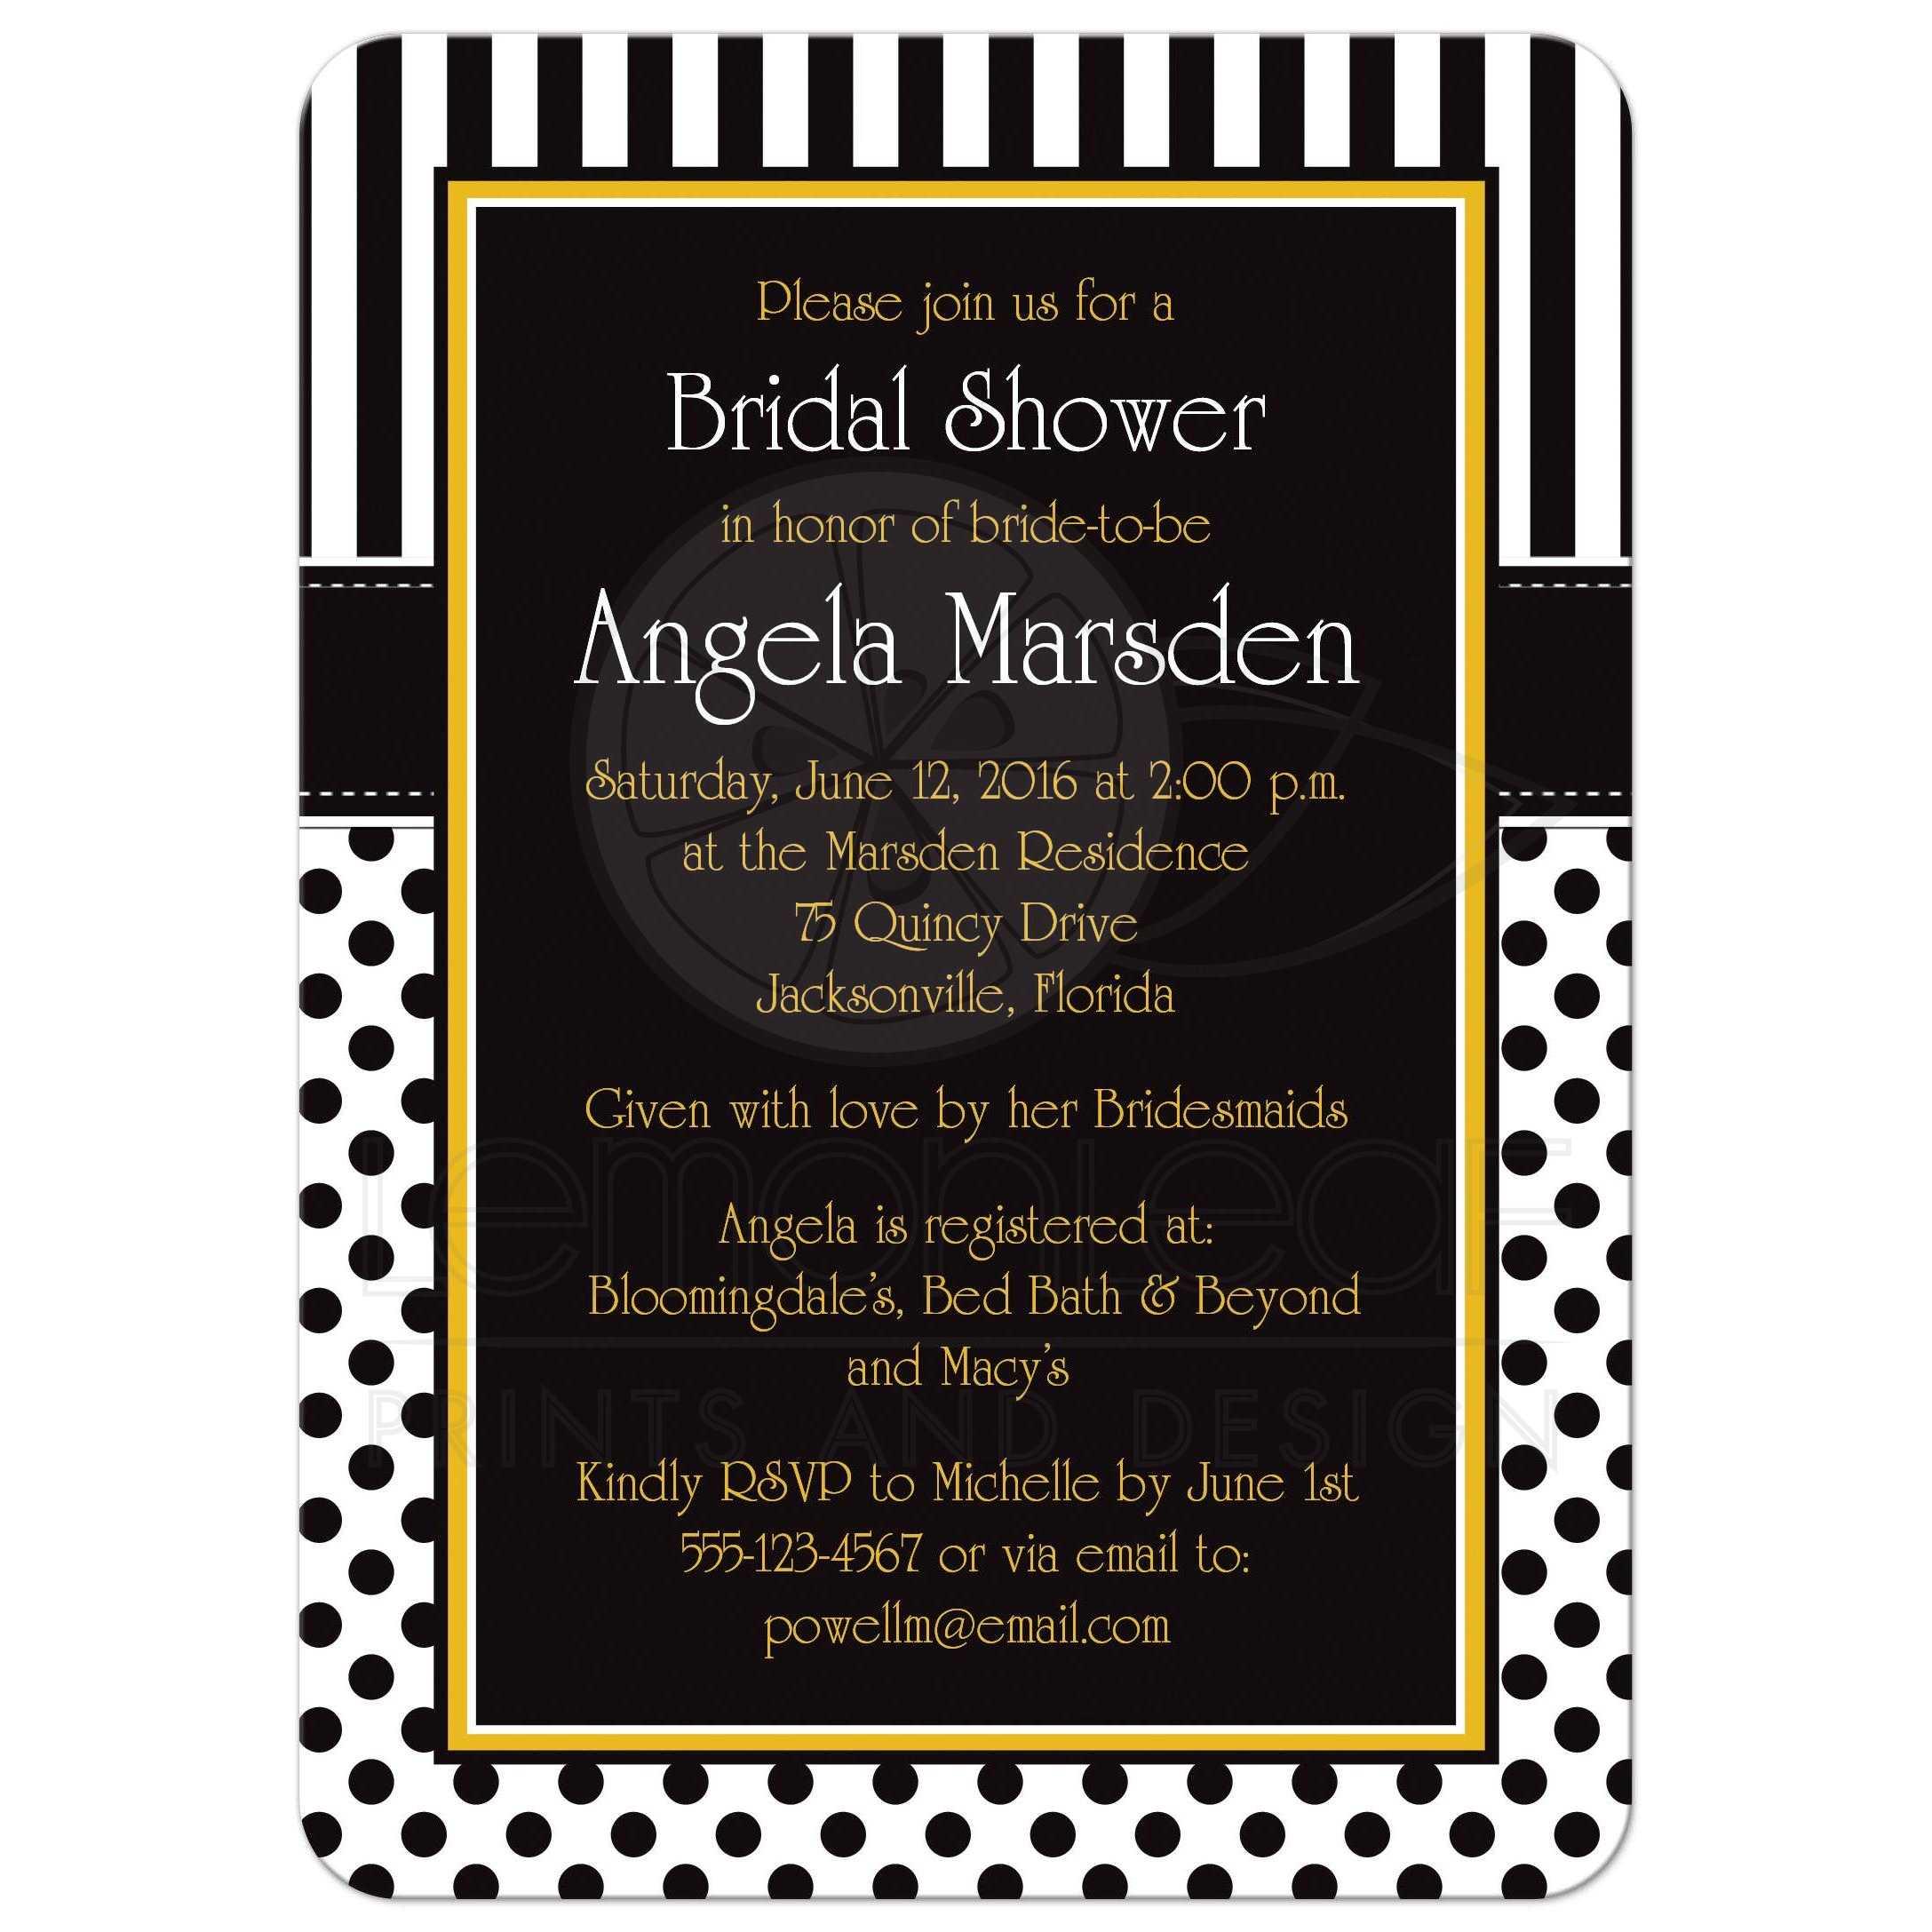 Bridal Shower Invitation Black White Yellow Polka Dots and Stripes